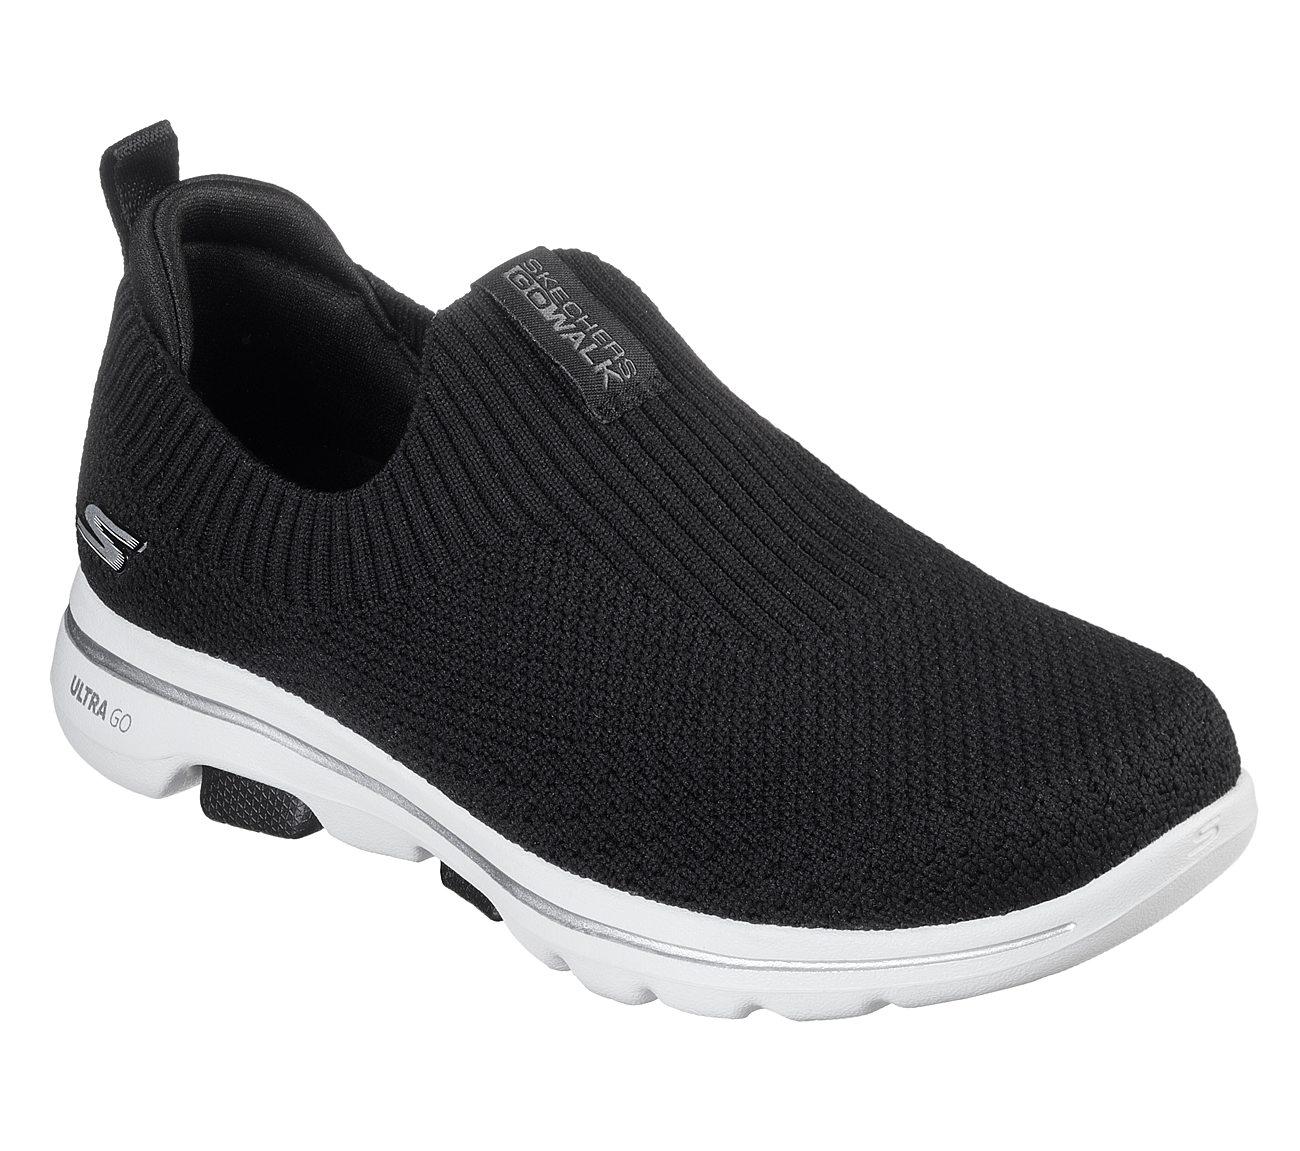 Skechers GOwalk 5 - Trendy